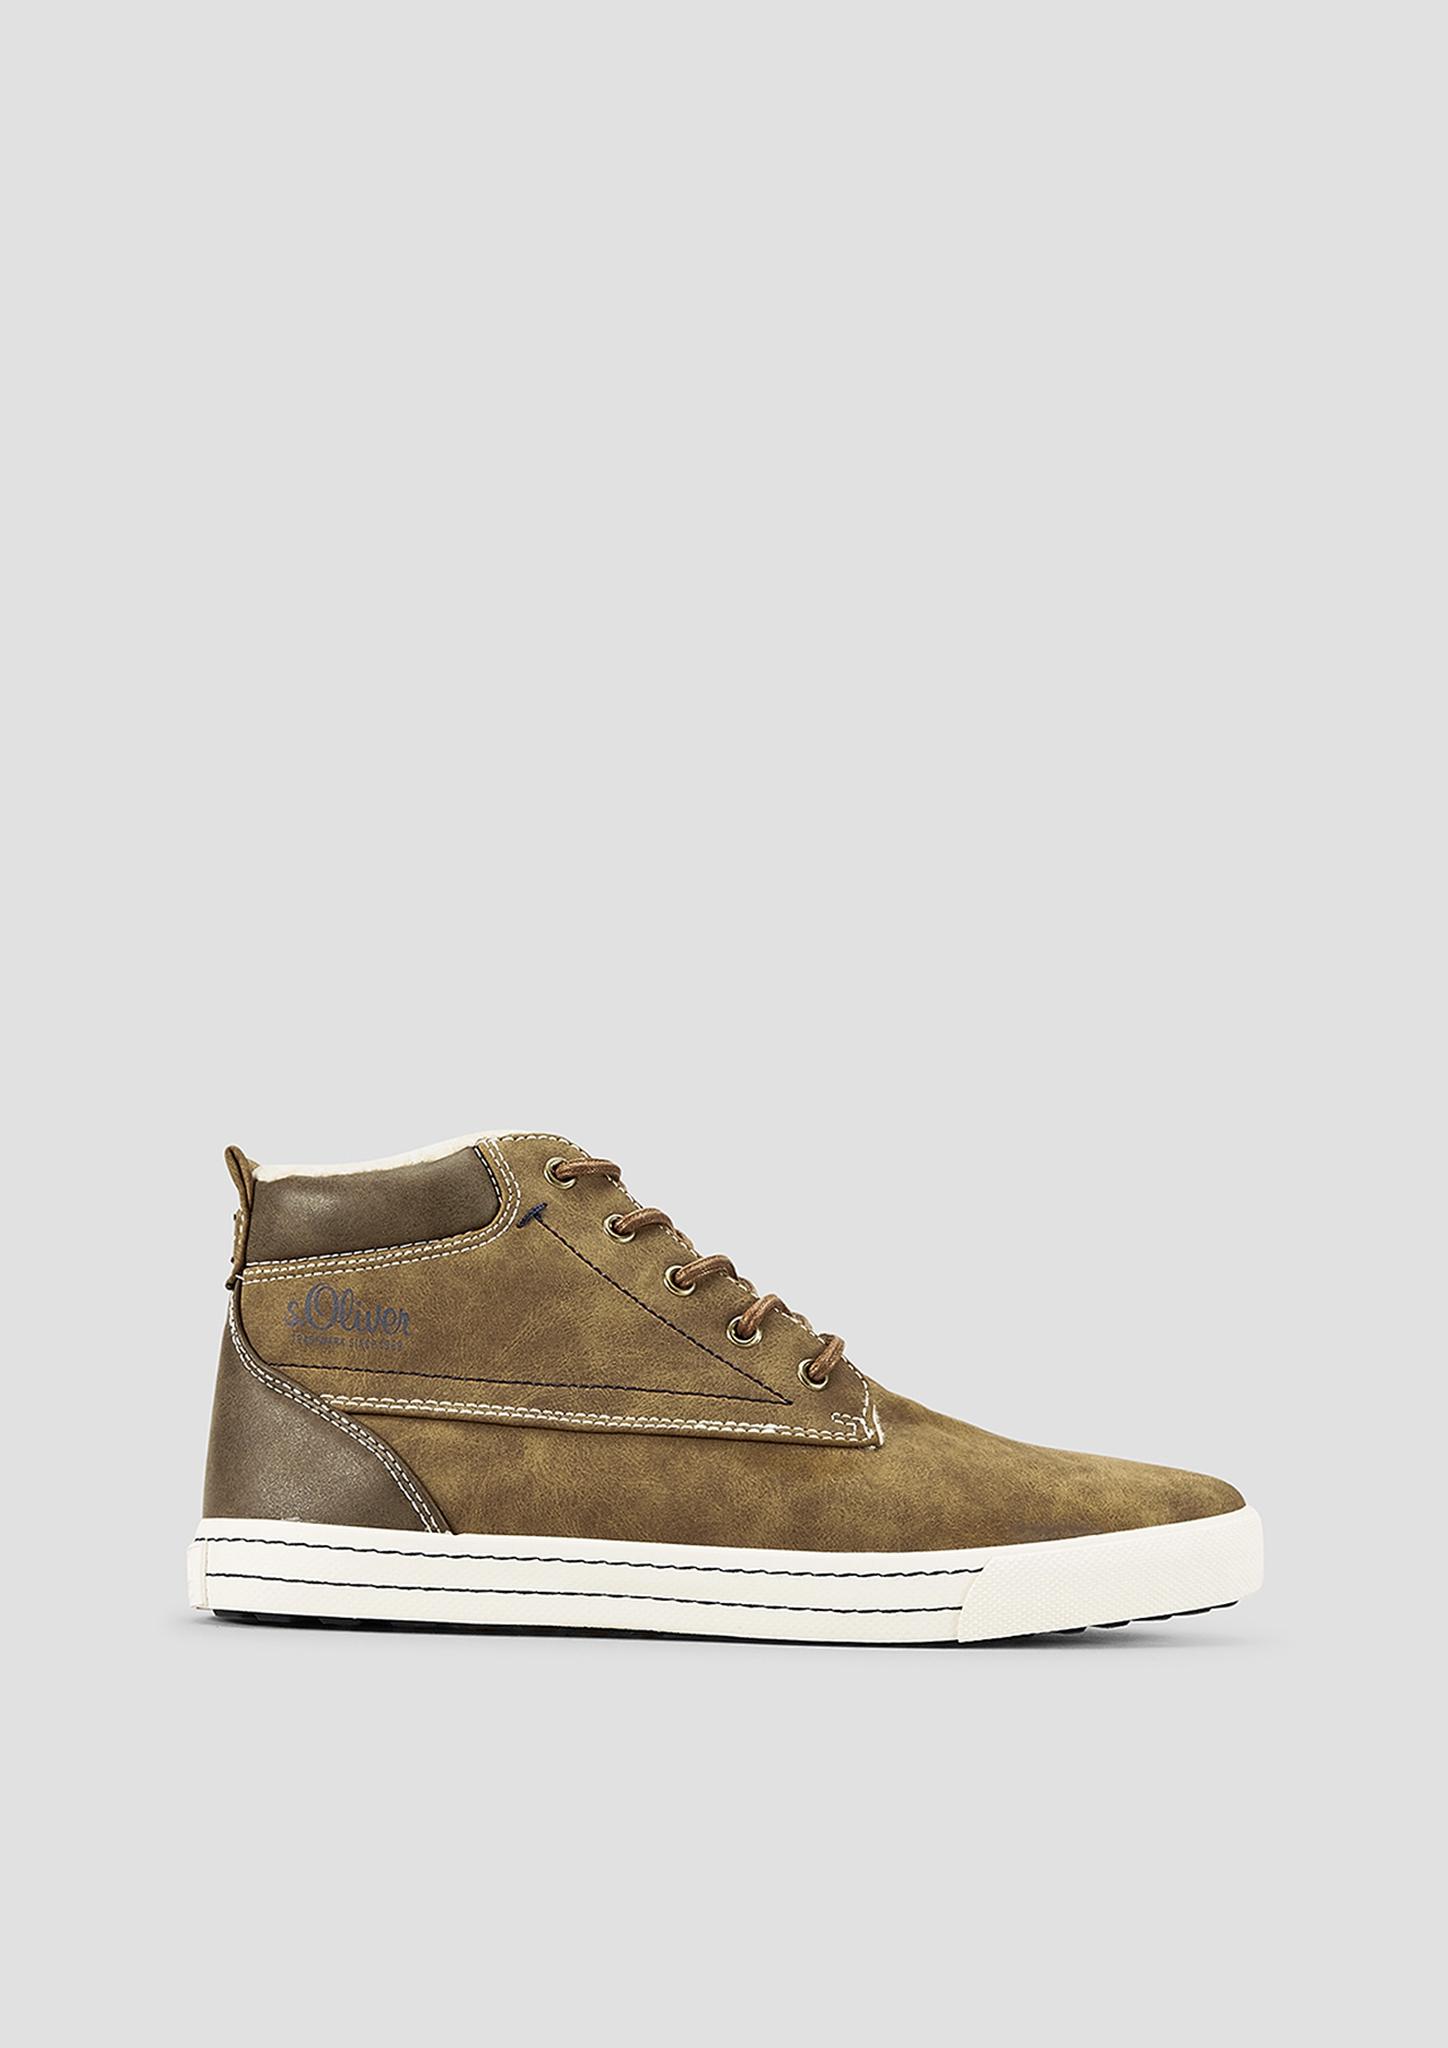 Stiefel | Schuhe | Braun | Obermaterial aus synthetik| futter und decksohle aus textil| laufsohle aus synthetik | s.Oliver